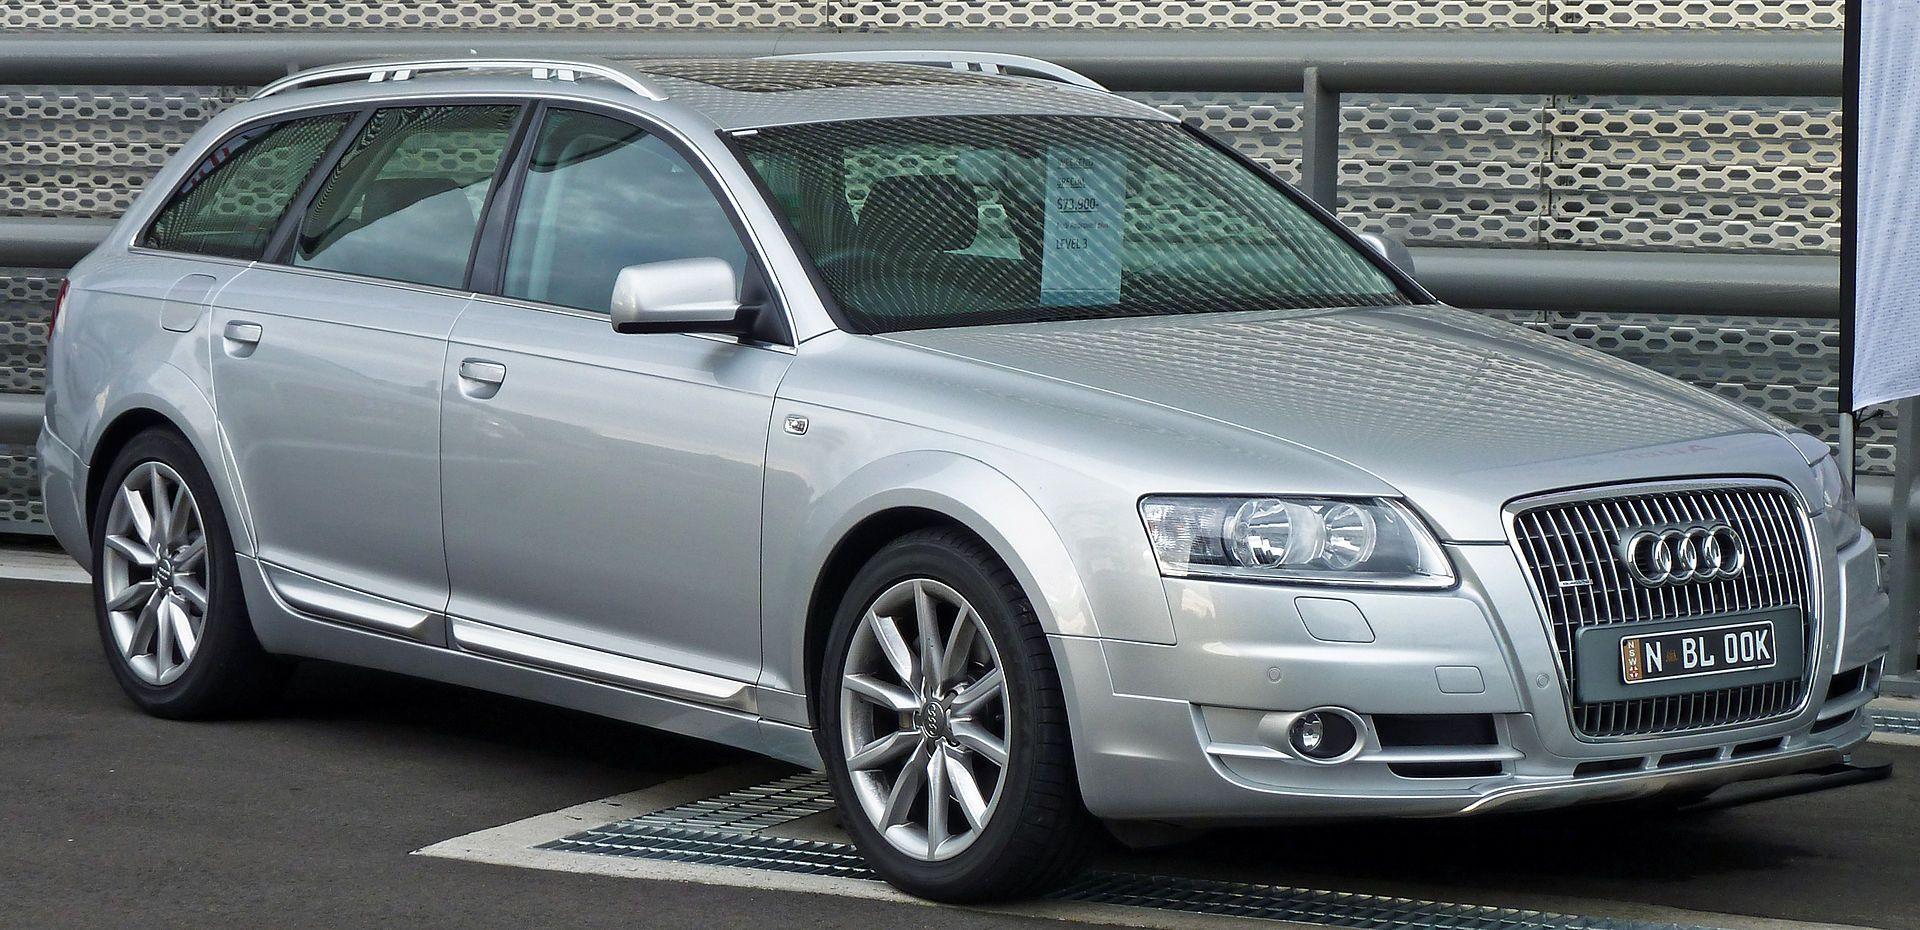 2007 audi a6 4f allroad quattro 3 0 tdi station wagon 02 audi a6